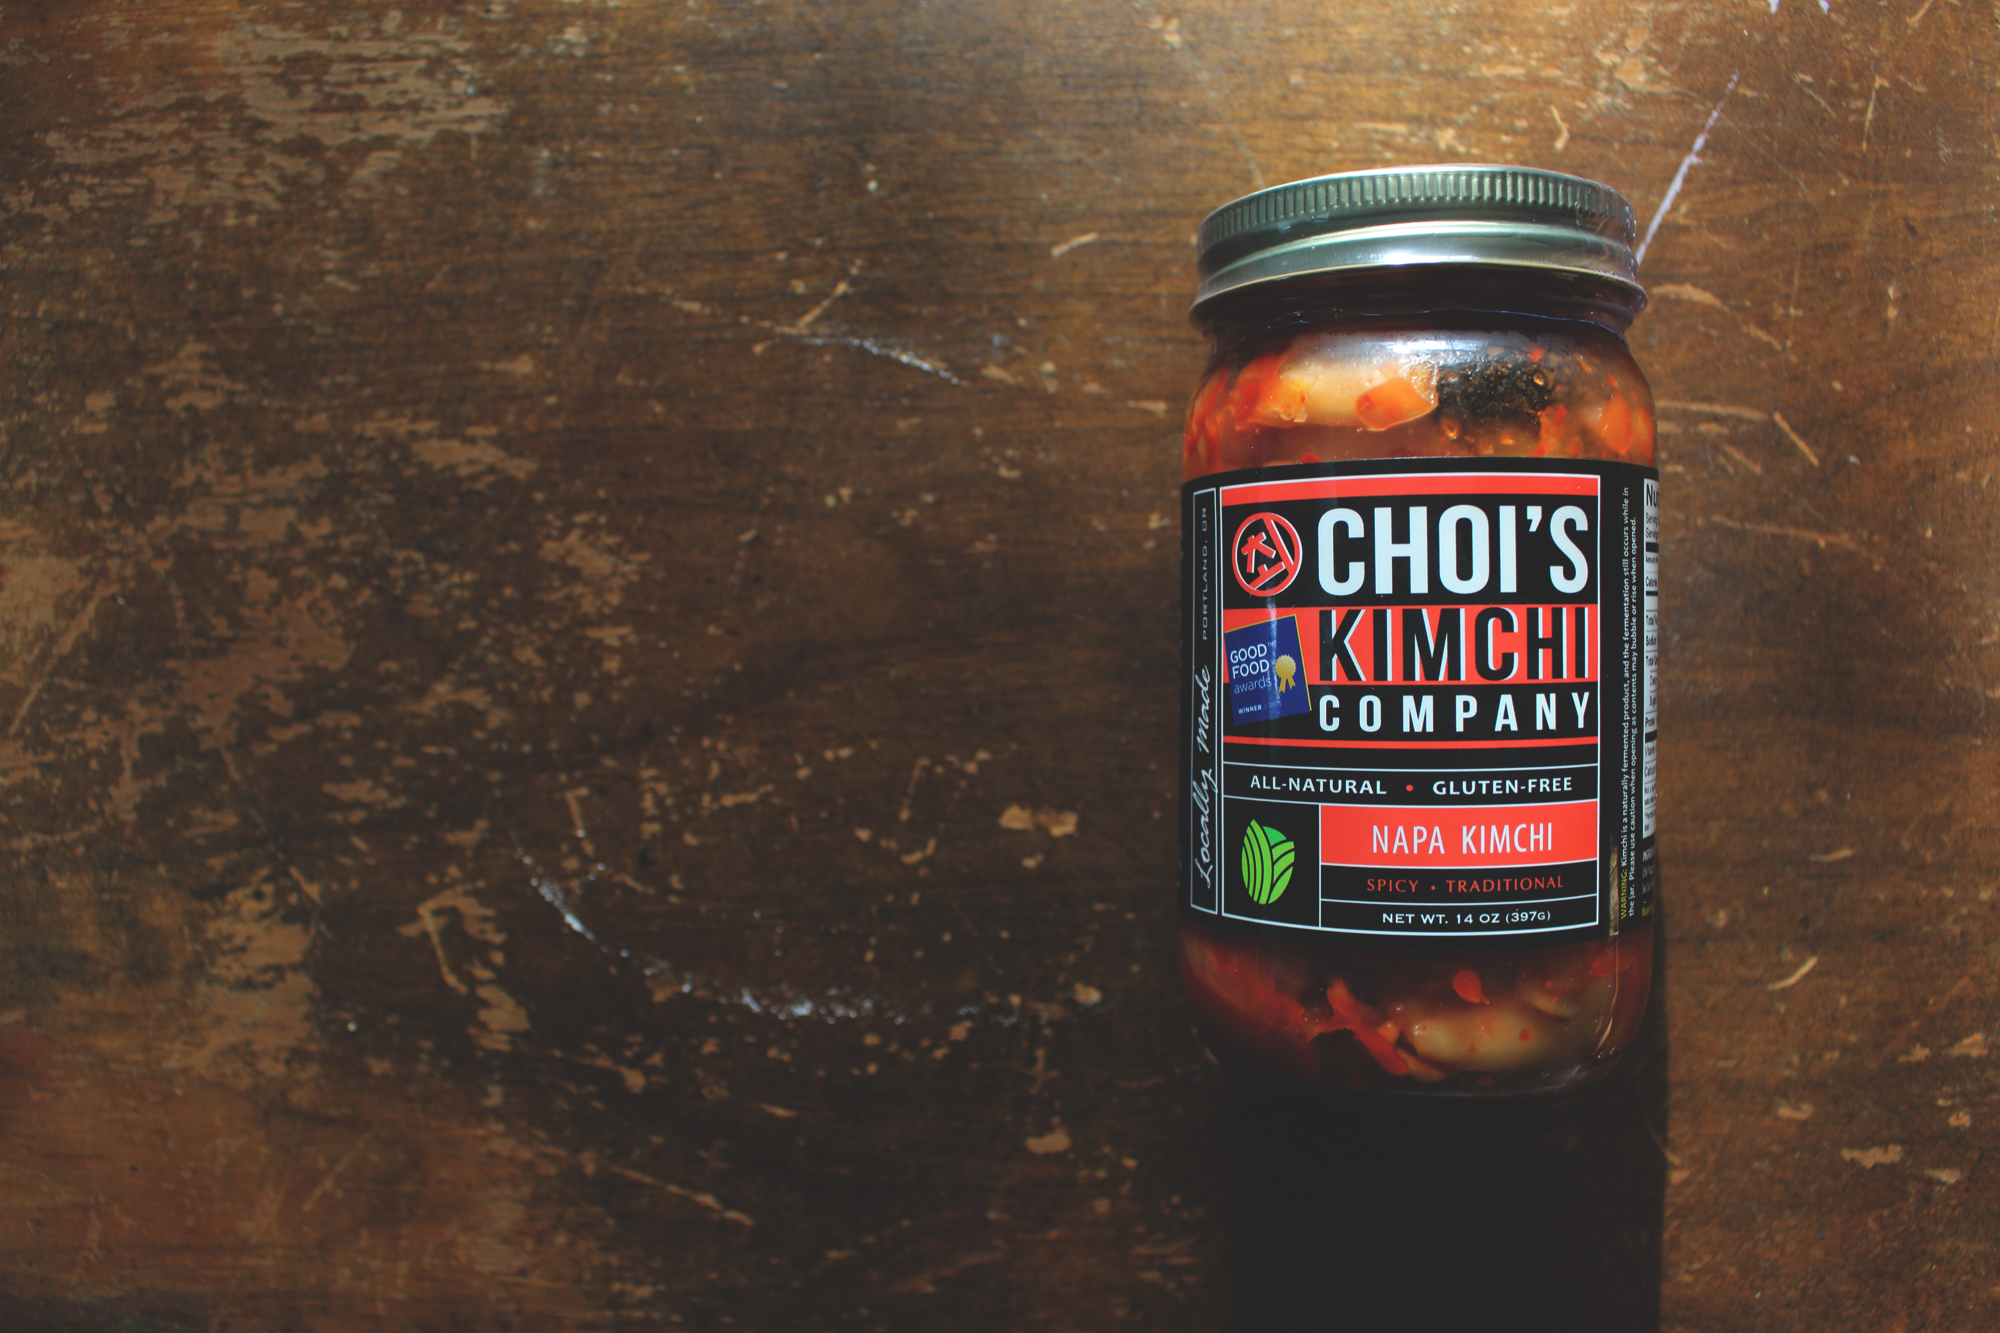 Choi's Kimchi